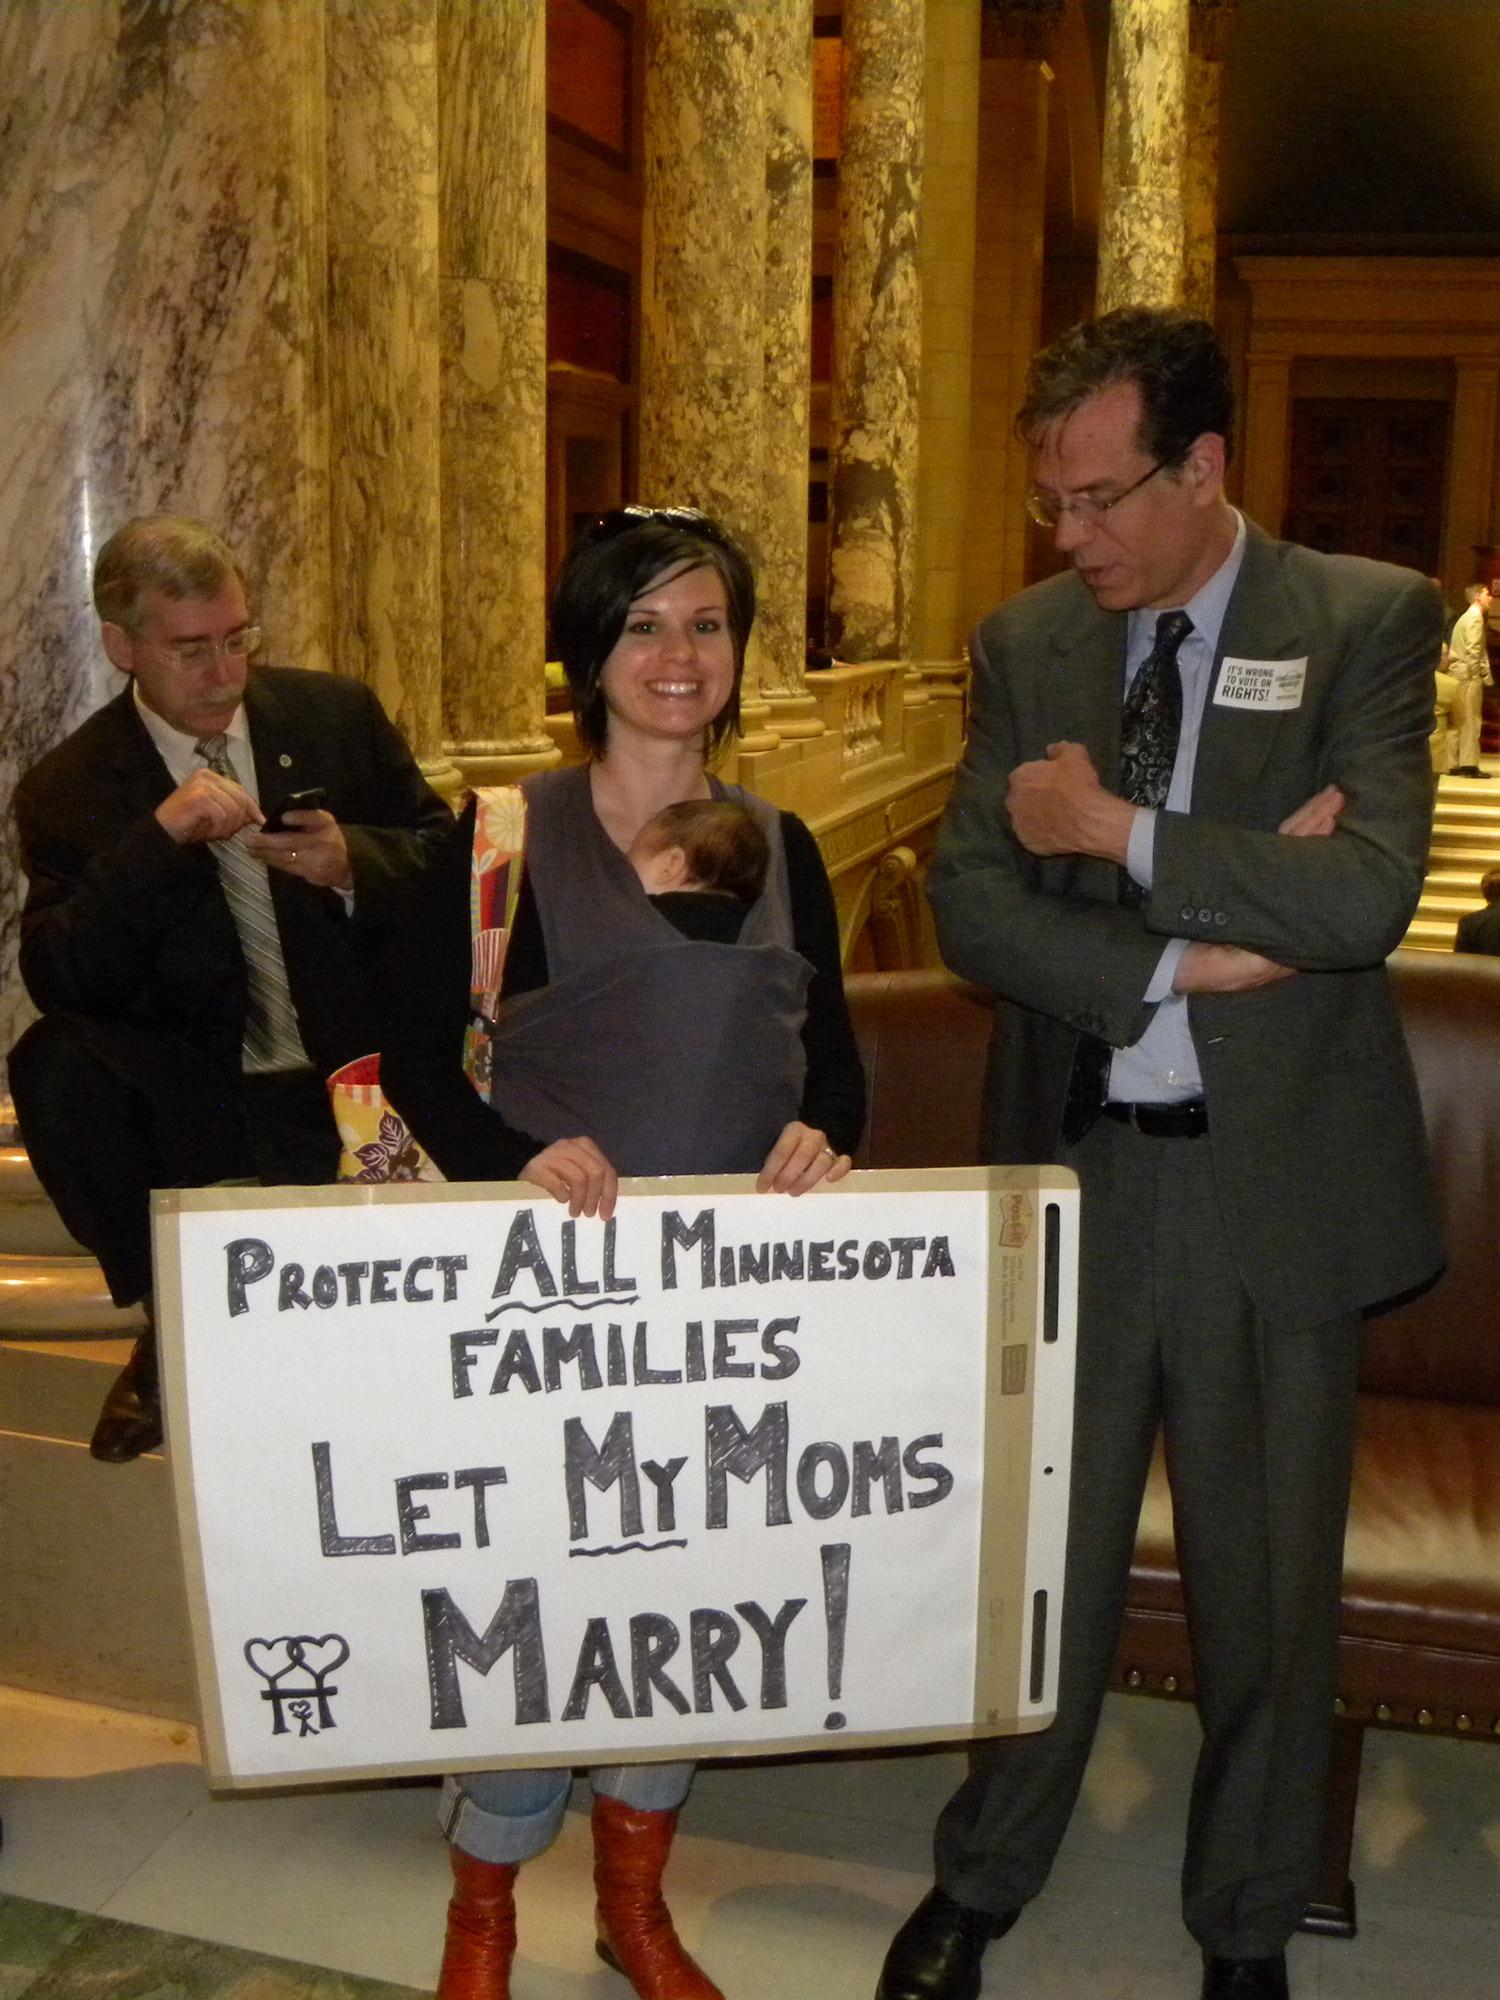 Amendment banning same sex marriage